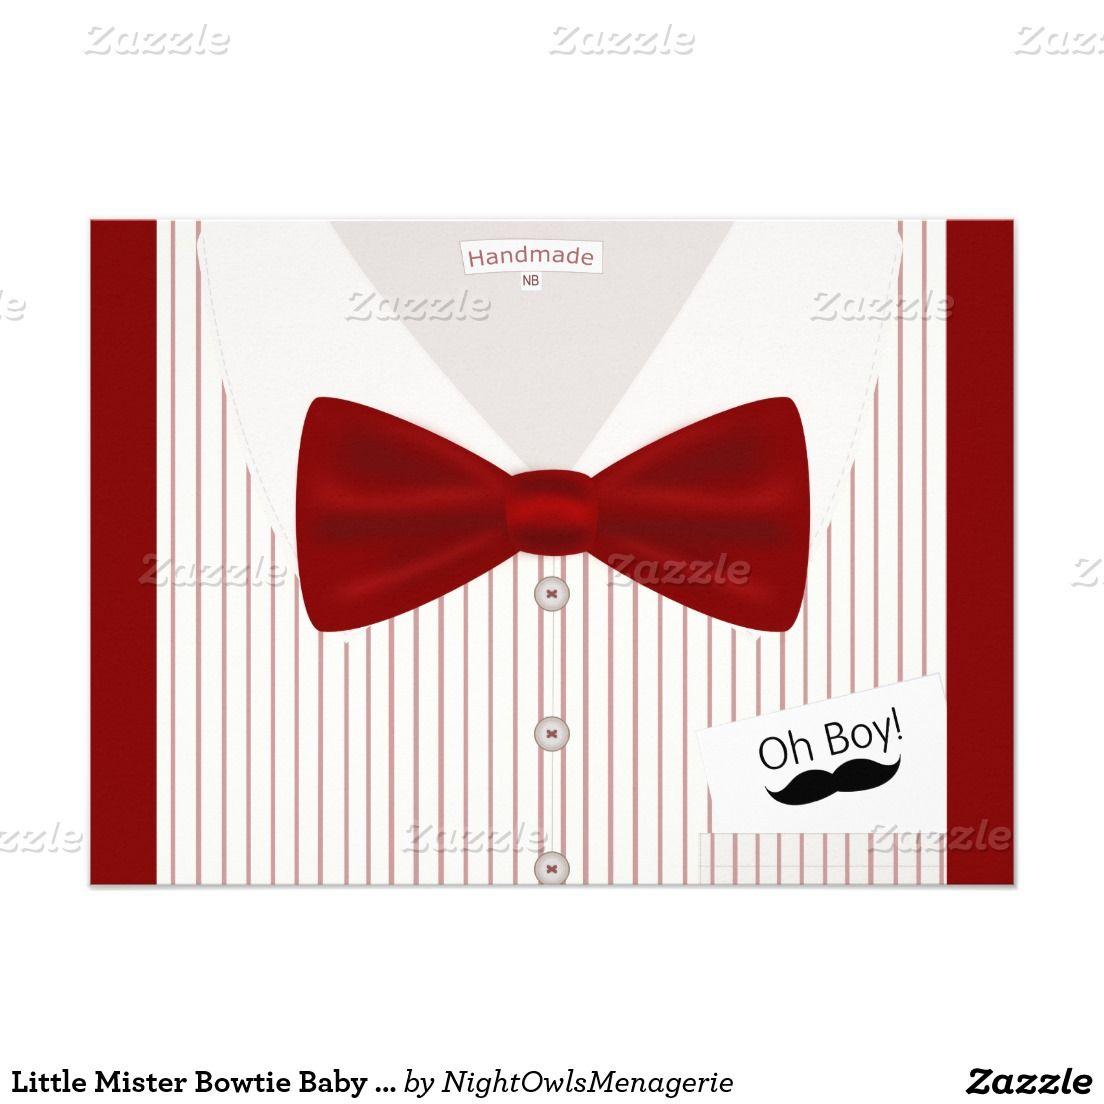 Enchanting Baby Shower Invitations Zazzle Elaboration - Invitations ...